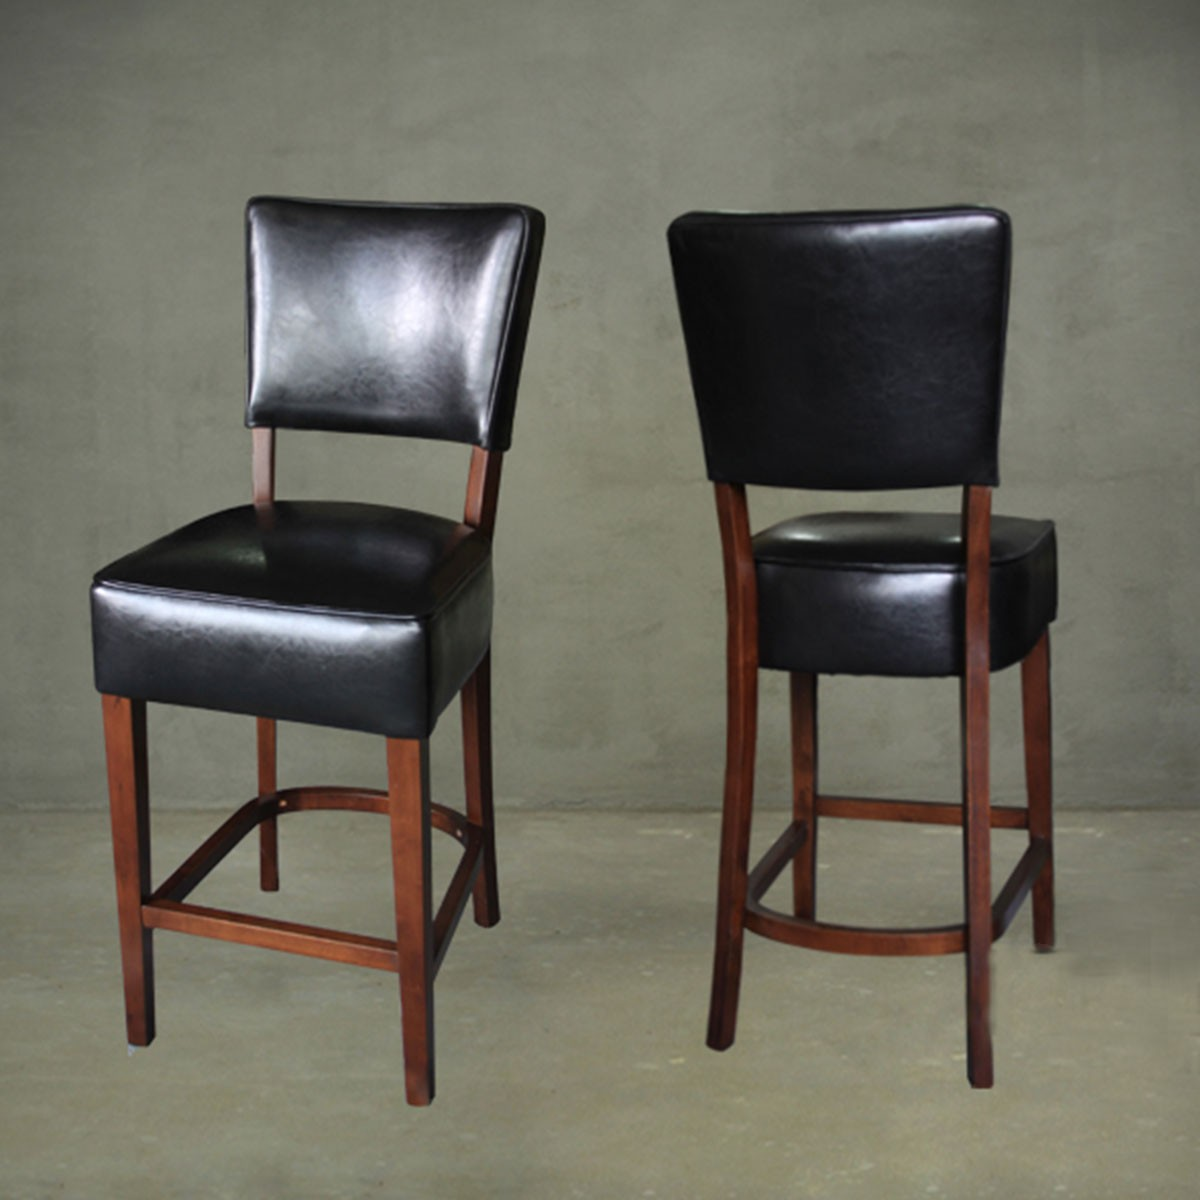 Upholstered Wooden Bar Stool Pjl609 Decoraport Usa